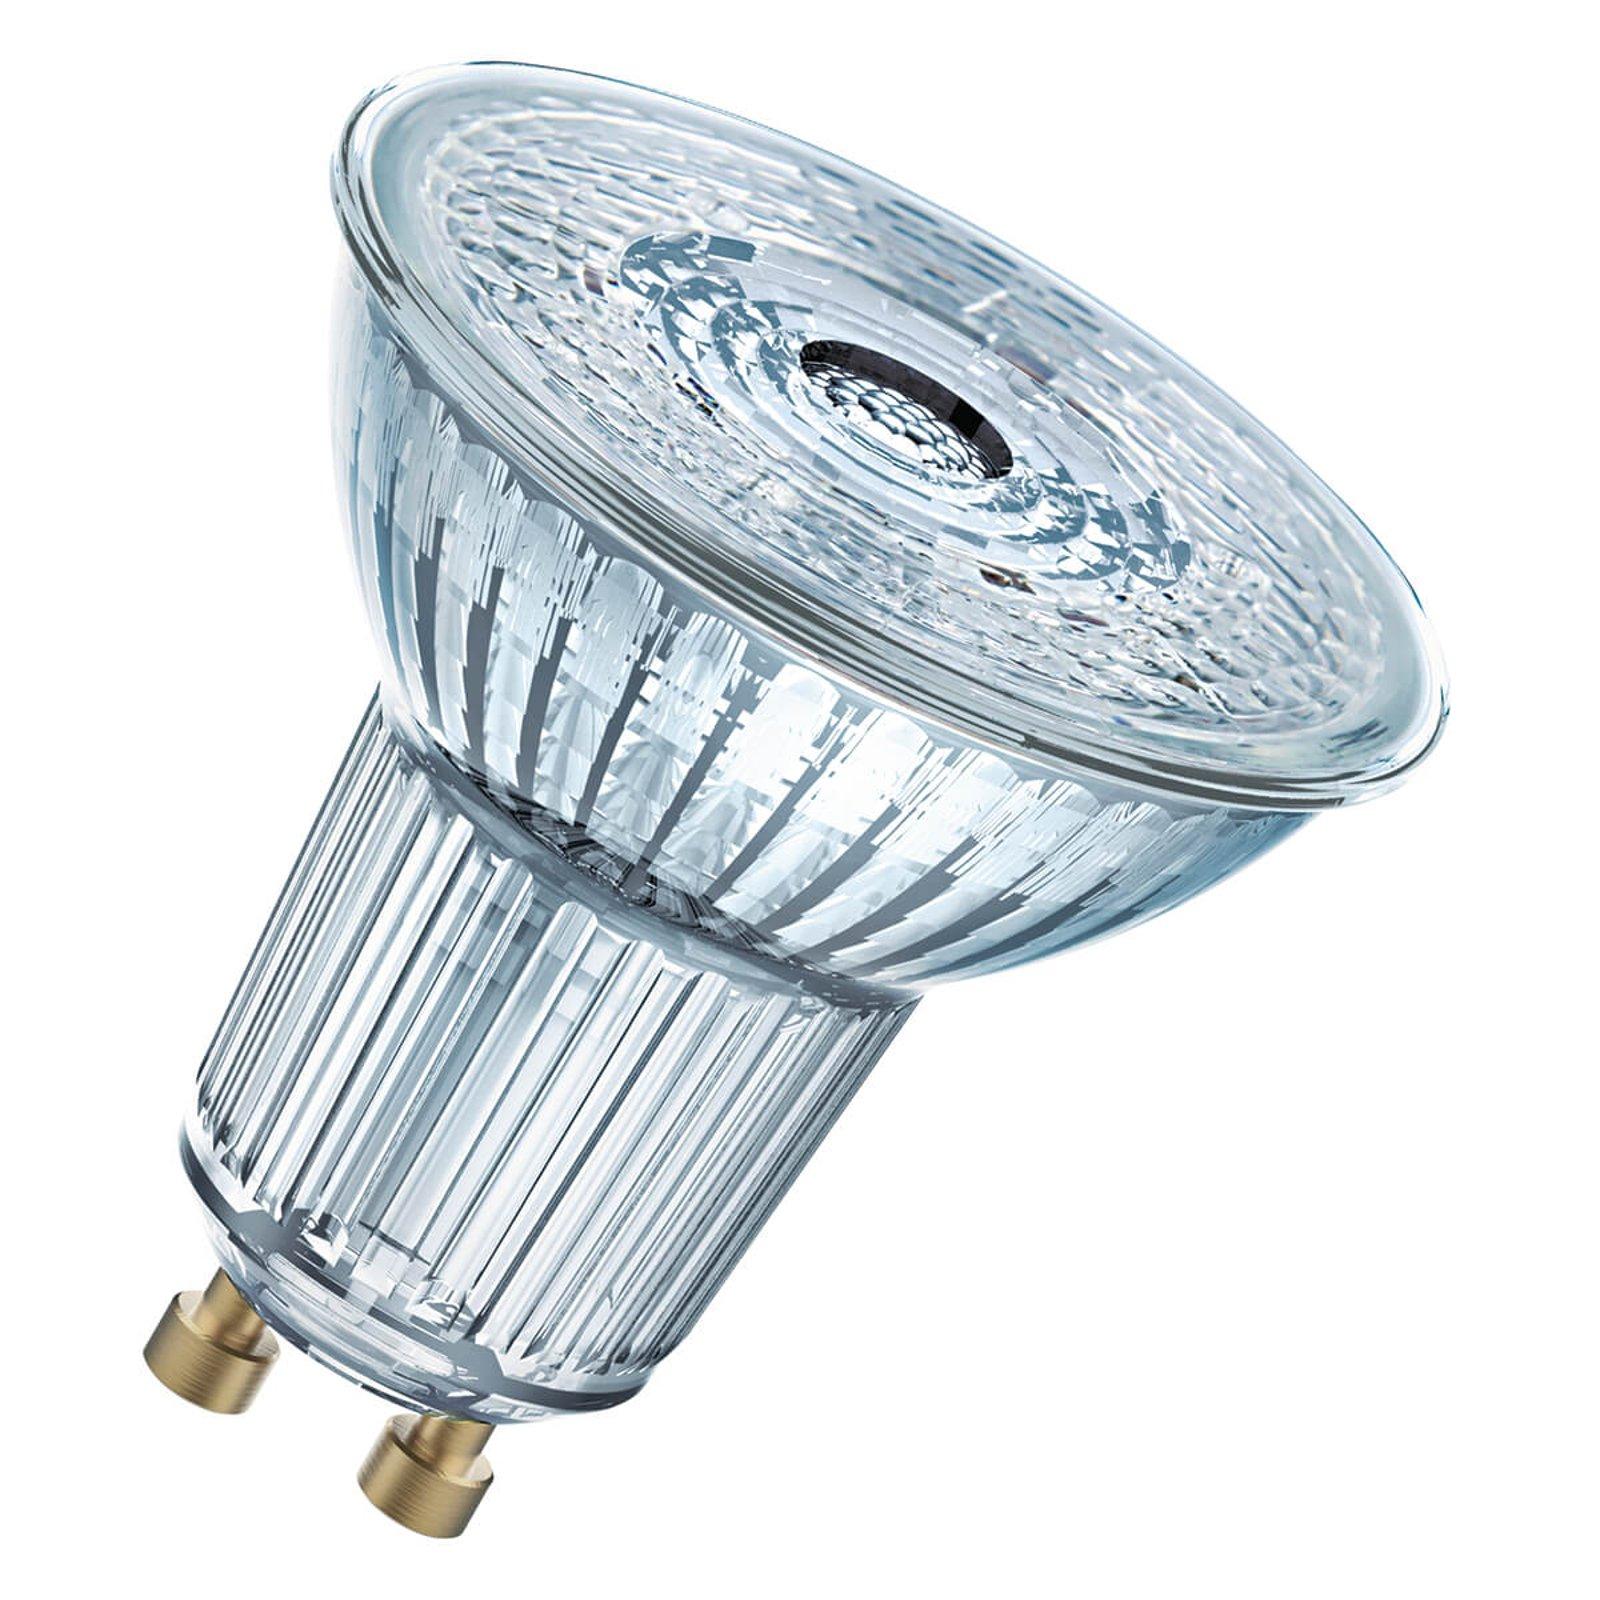 OSRAM LED-reflektor GU10 6,9W universalhvit 36°